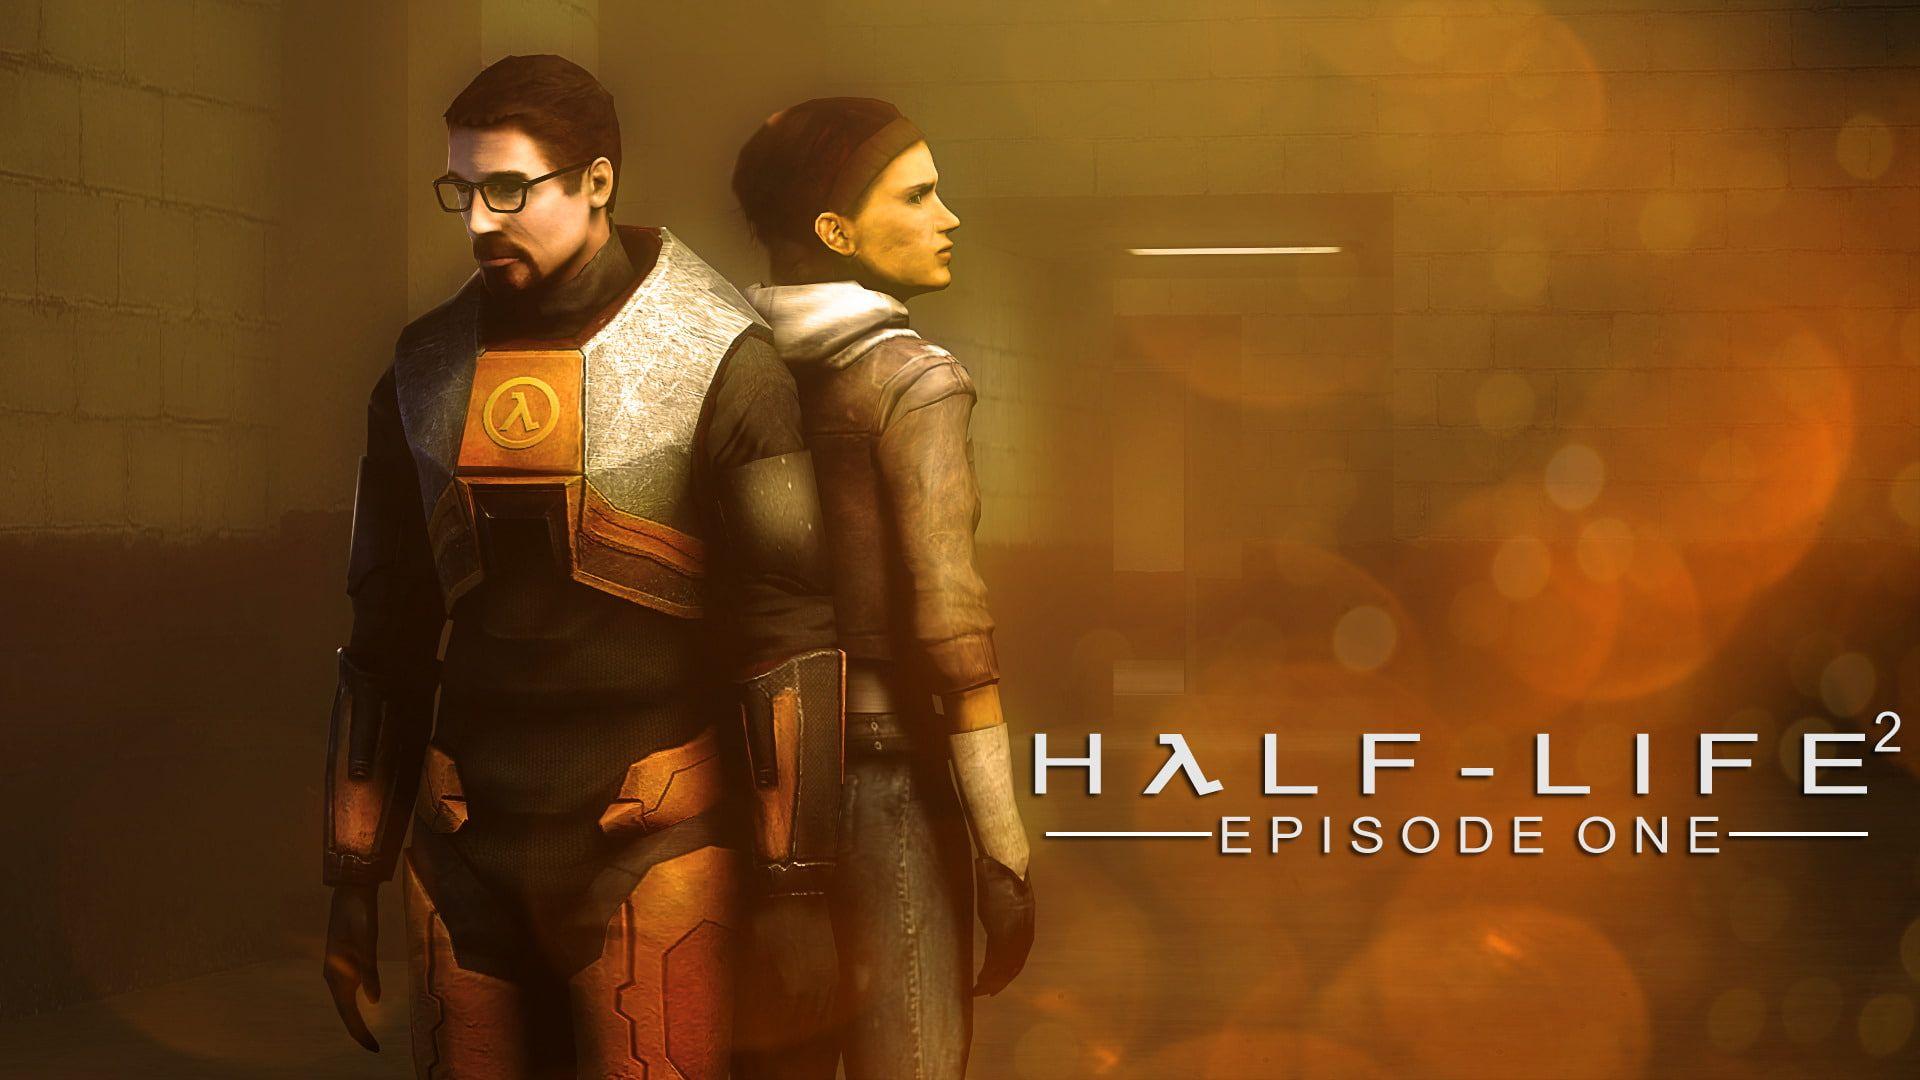 Half Life Half Life 2 Alyx Vance Gordon Freeman 1080p Wallpaper Hdwallpaper Desktop Half Life Half Life 2 Alyx Gordon Freeman